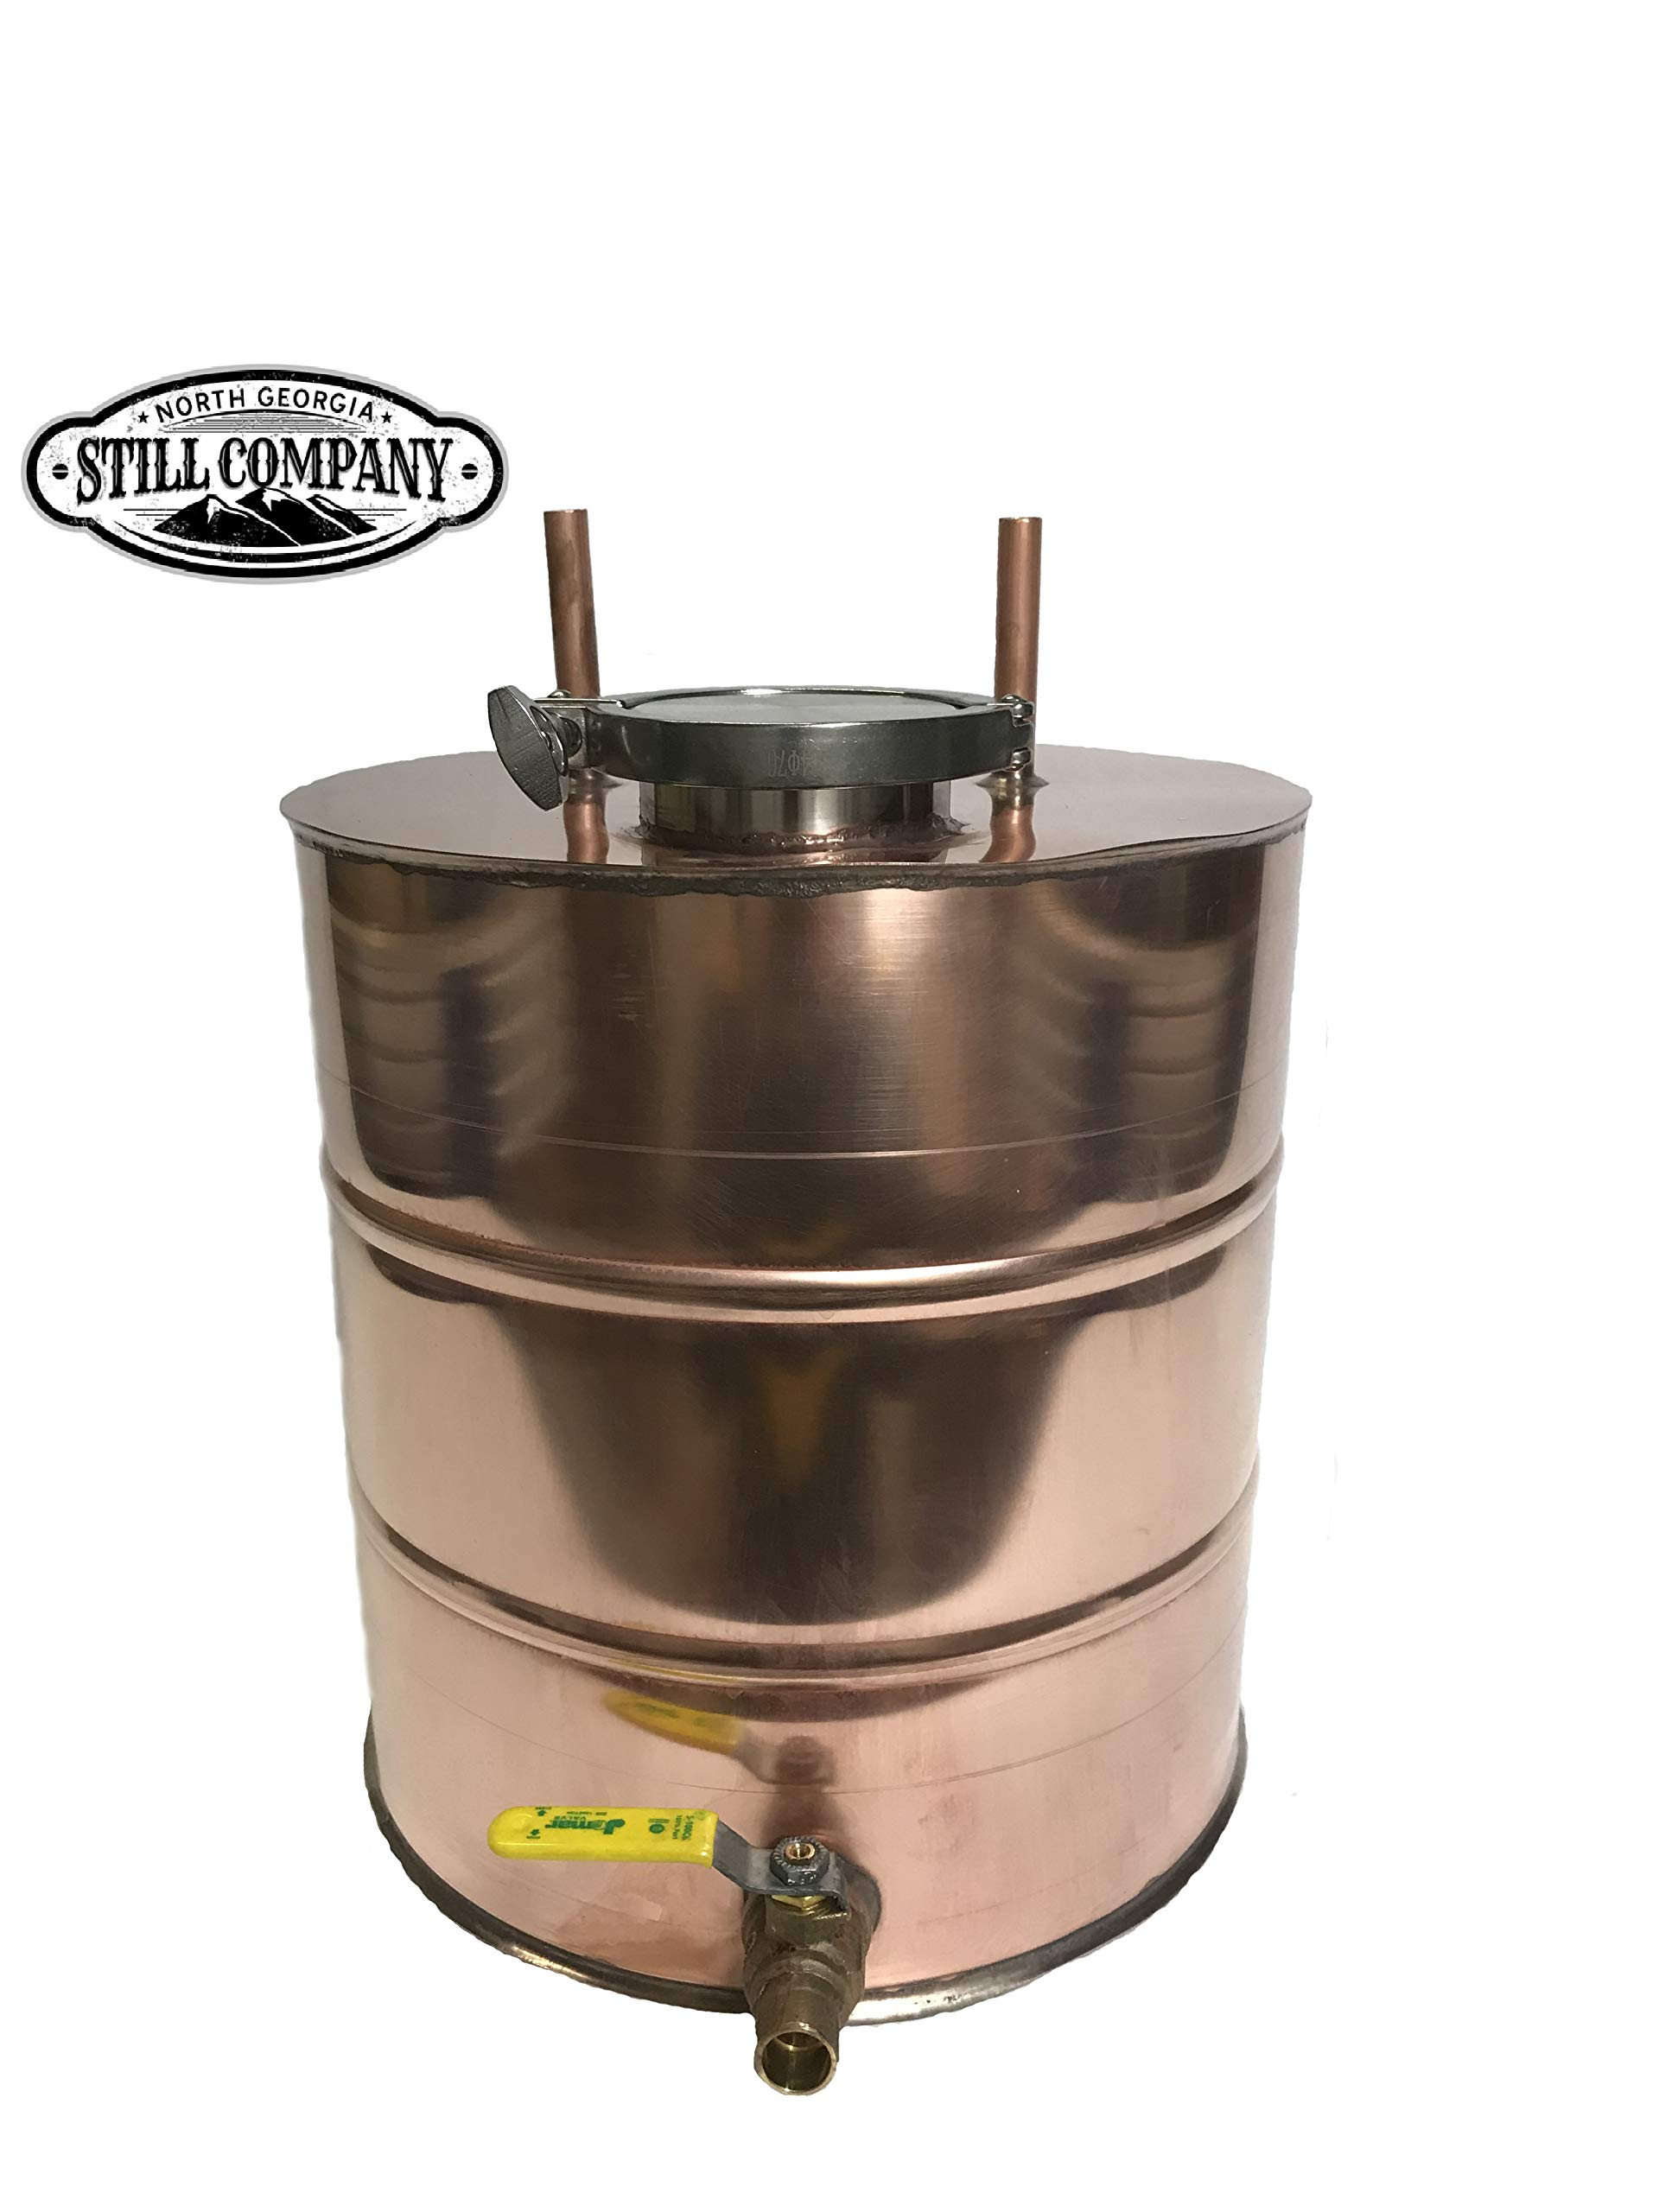 Moonshine Whiskey Still 5 Gallon Thumper Keg Doubler with 3 Inch Fruit Port & Ball Valve Drain, 1/2 OD Tubing by North Georgia Still Company